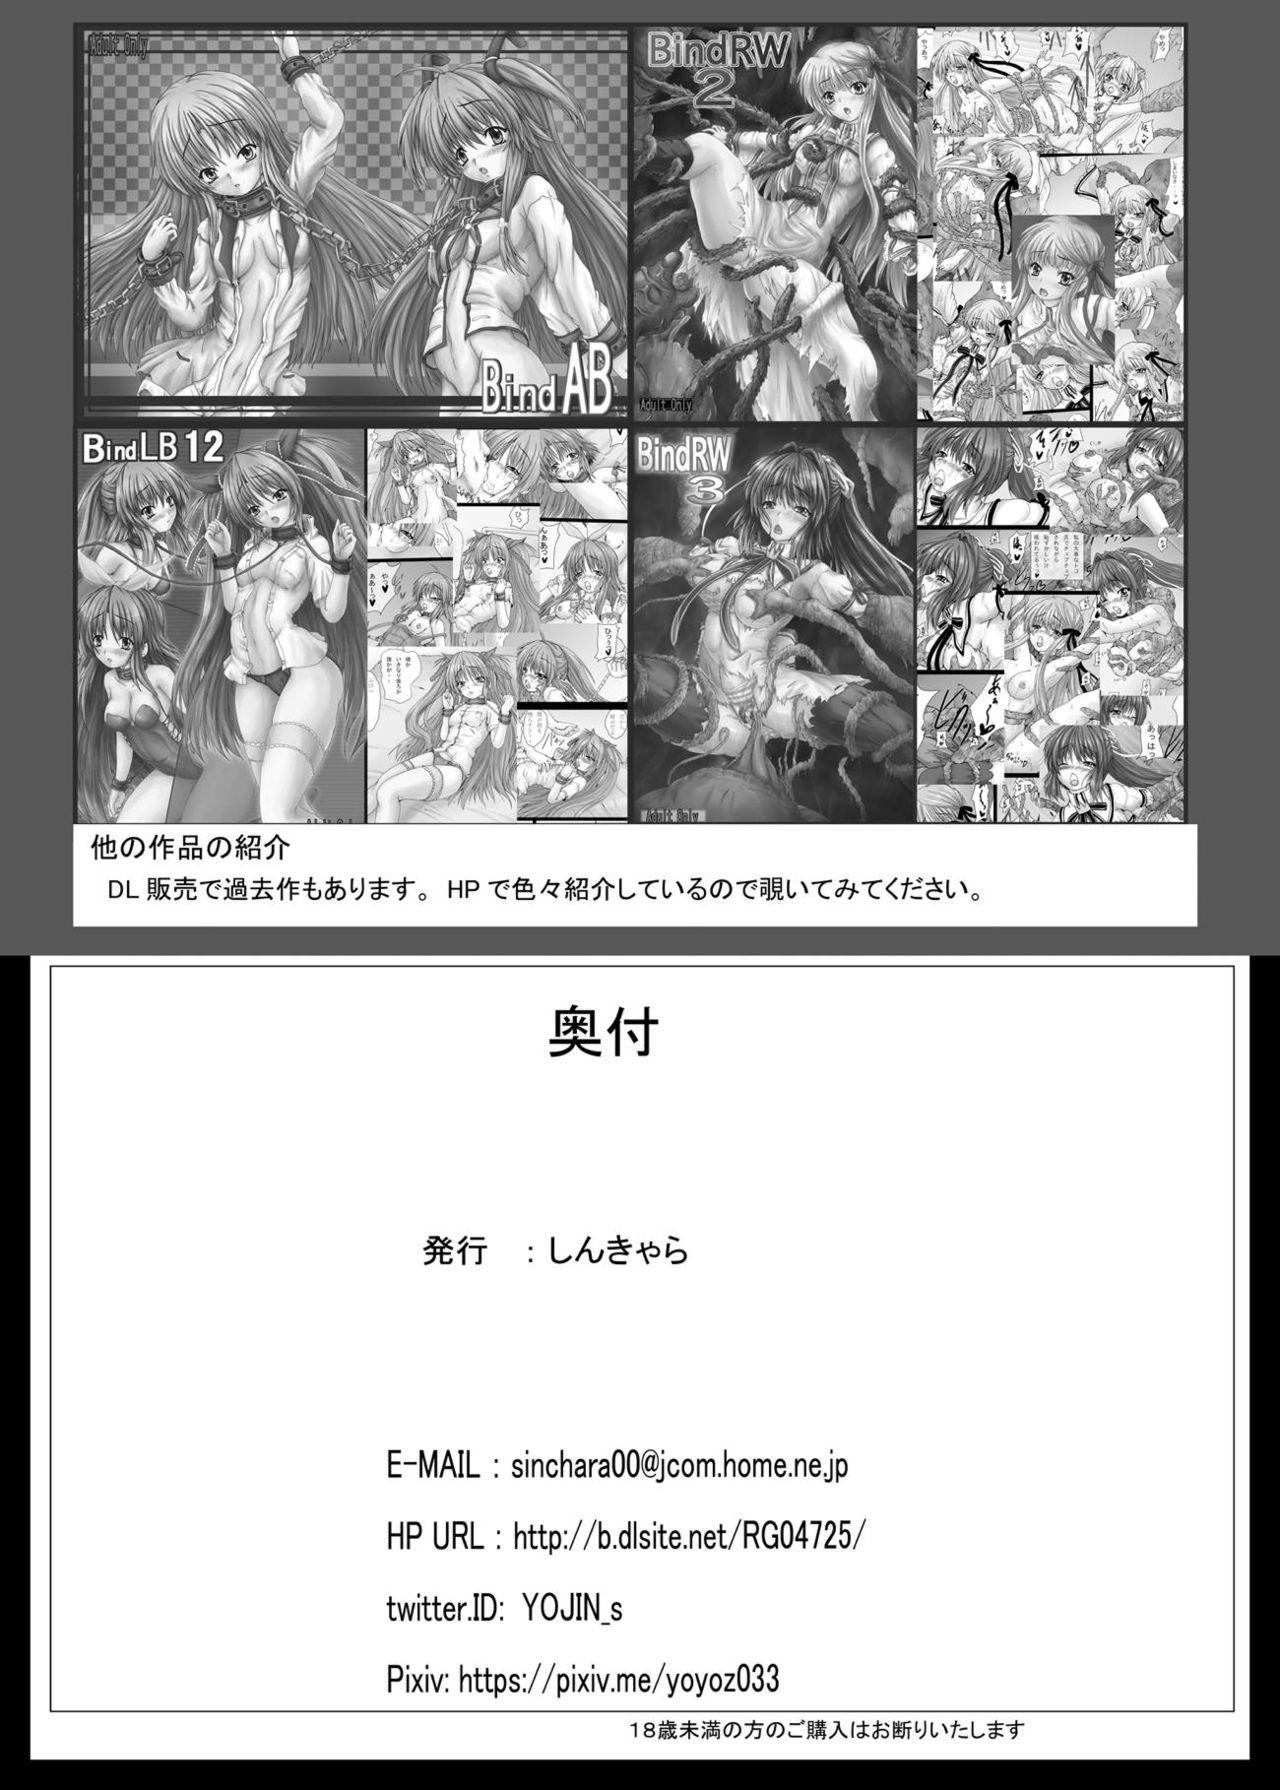 [Shinchara (YO-JIN)] Aigis Shokushu Taisen 2 - Elyse-chan to Shokushu to Slime | Aigis Tentacle Battle 2 - Elyse-chan And The Tentacle Slime (Sennen Sensou Aigis) [English] {Doujins.com} [Digital] 22